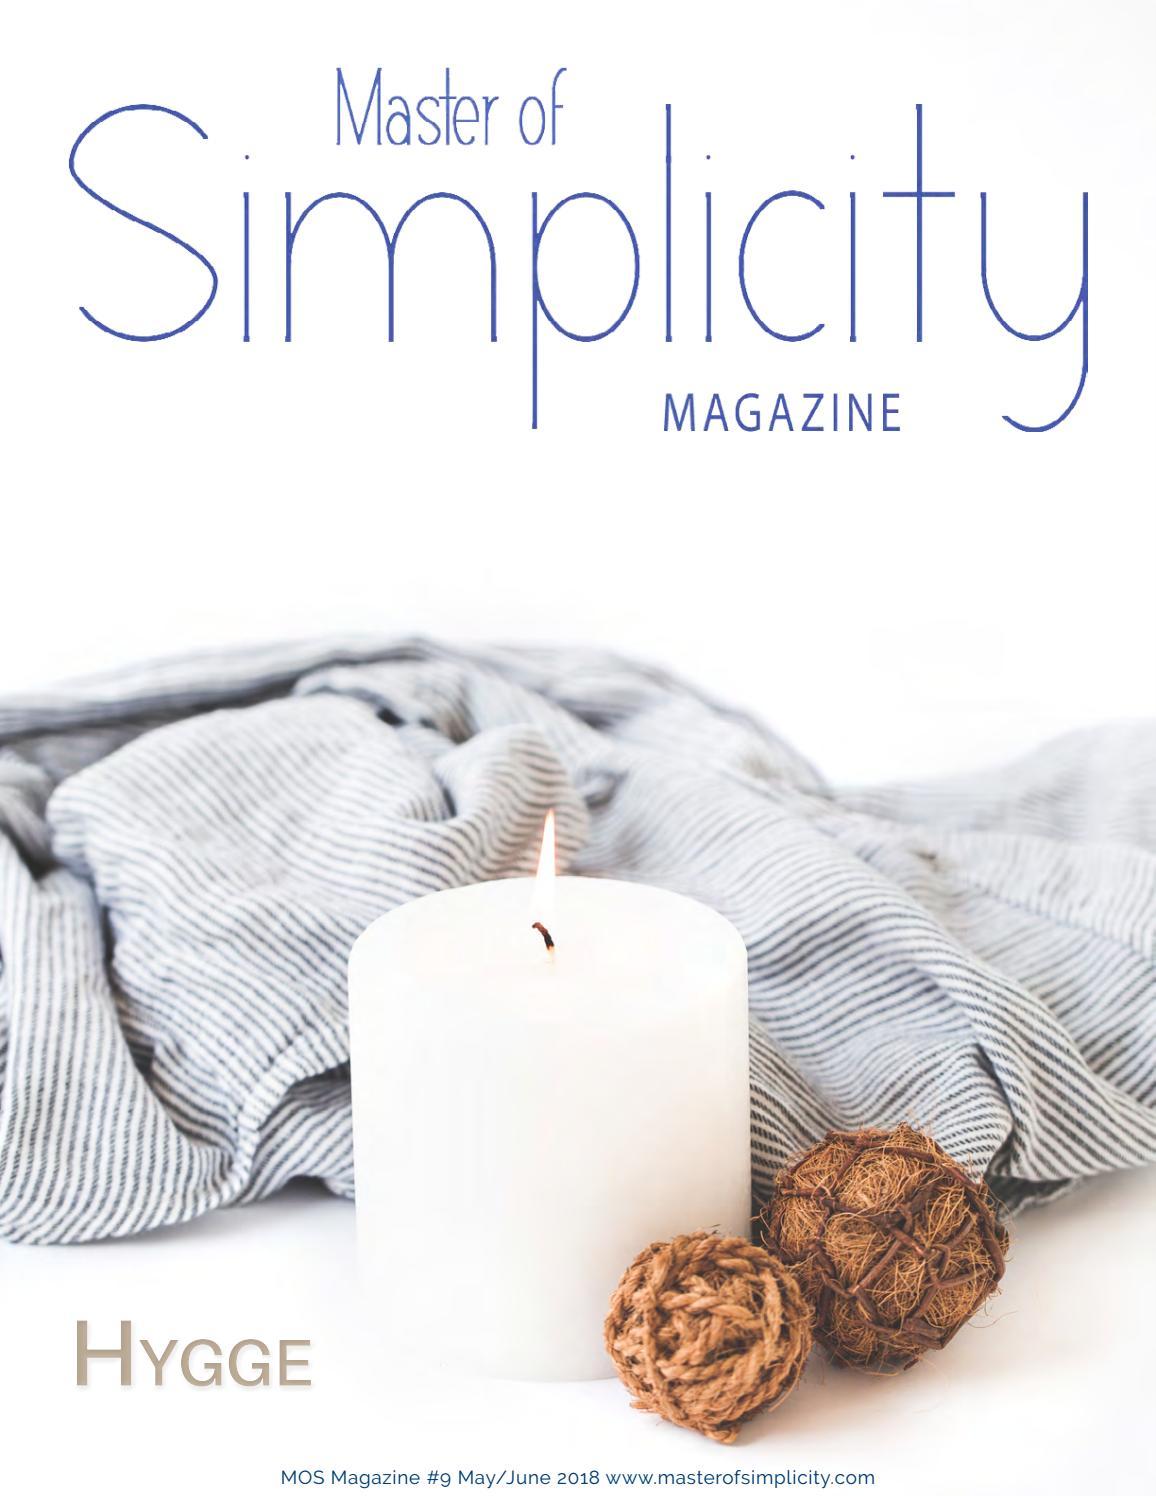 Mos Magazine 9 Eng By Master Of Simplicity Issuu Uha Chocolate Milk Candy 103g